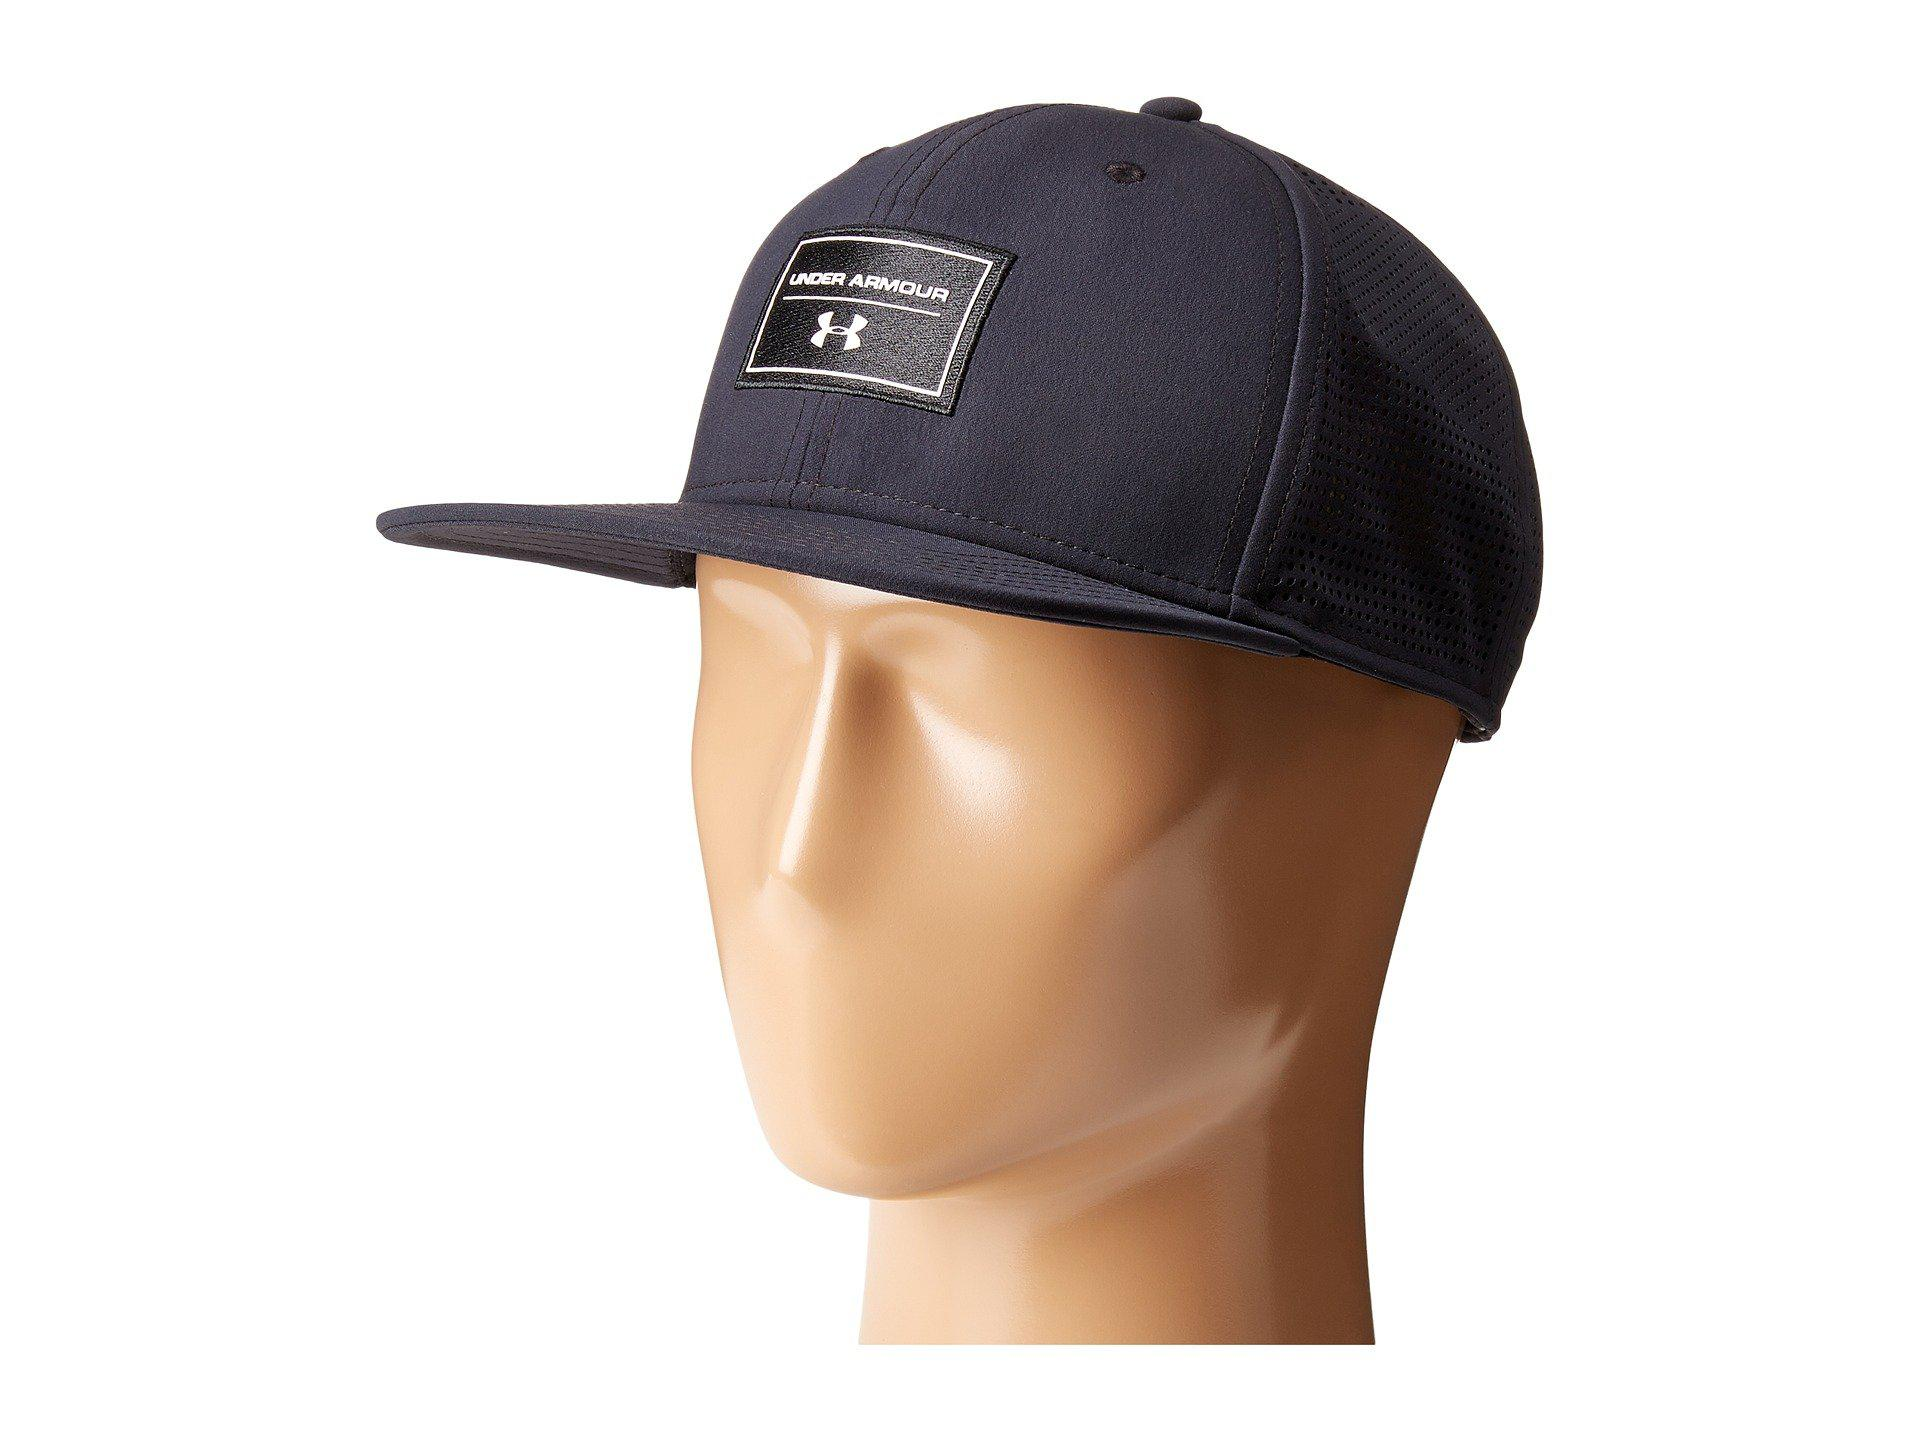 promo code b9798 f958f Under Armour Ua Supervent Fb Hat in Black for Men - Lyst